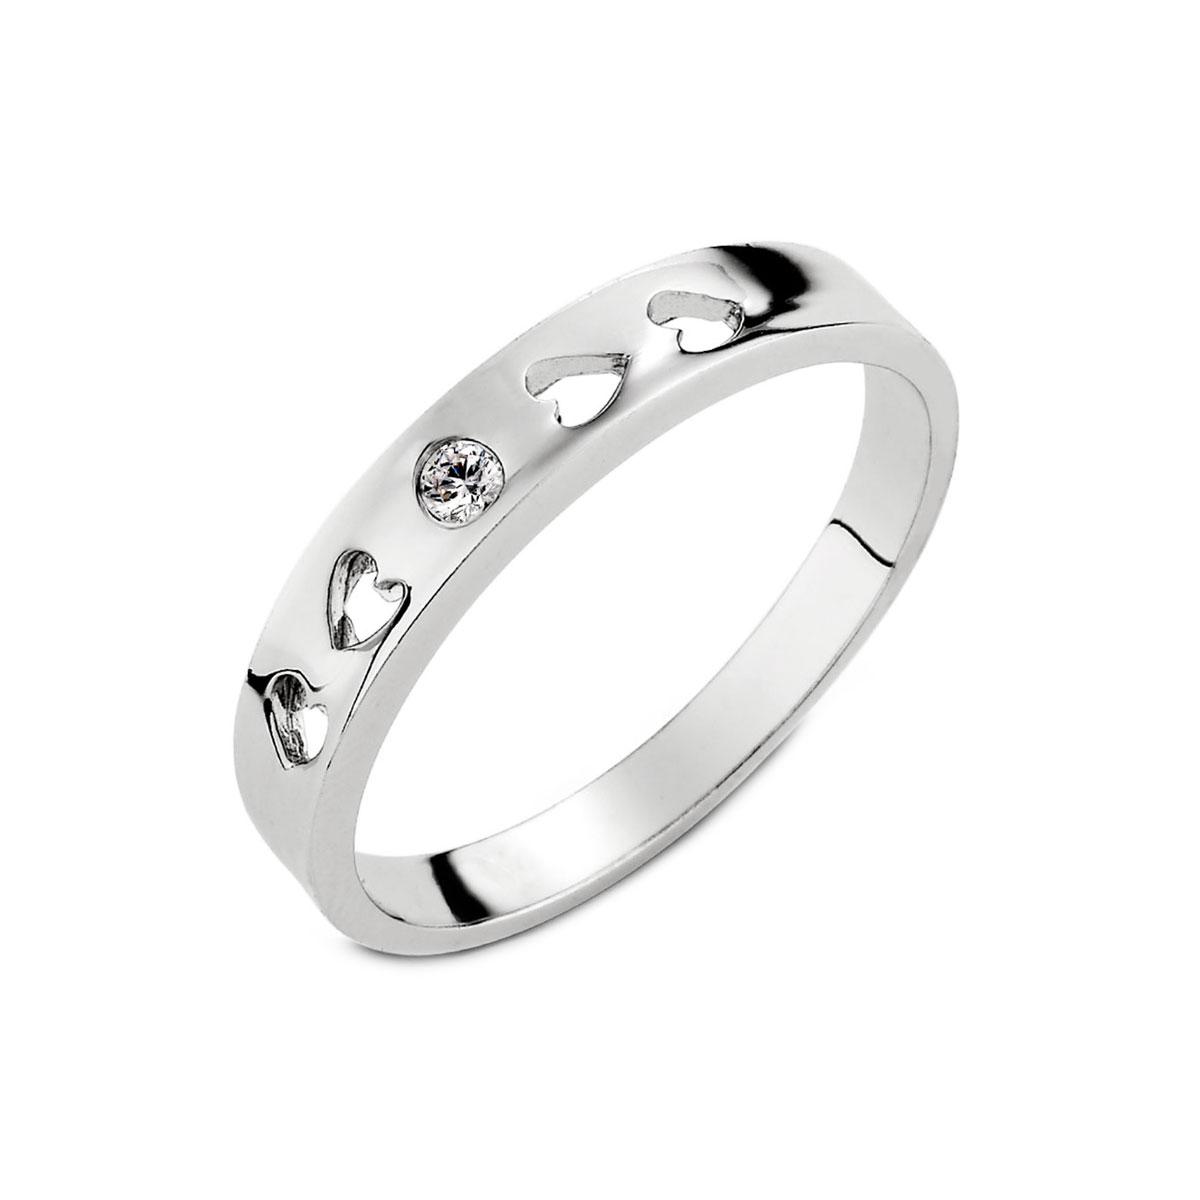 KSW274 心上人單鑽簍空戒指